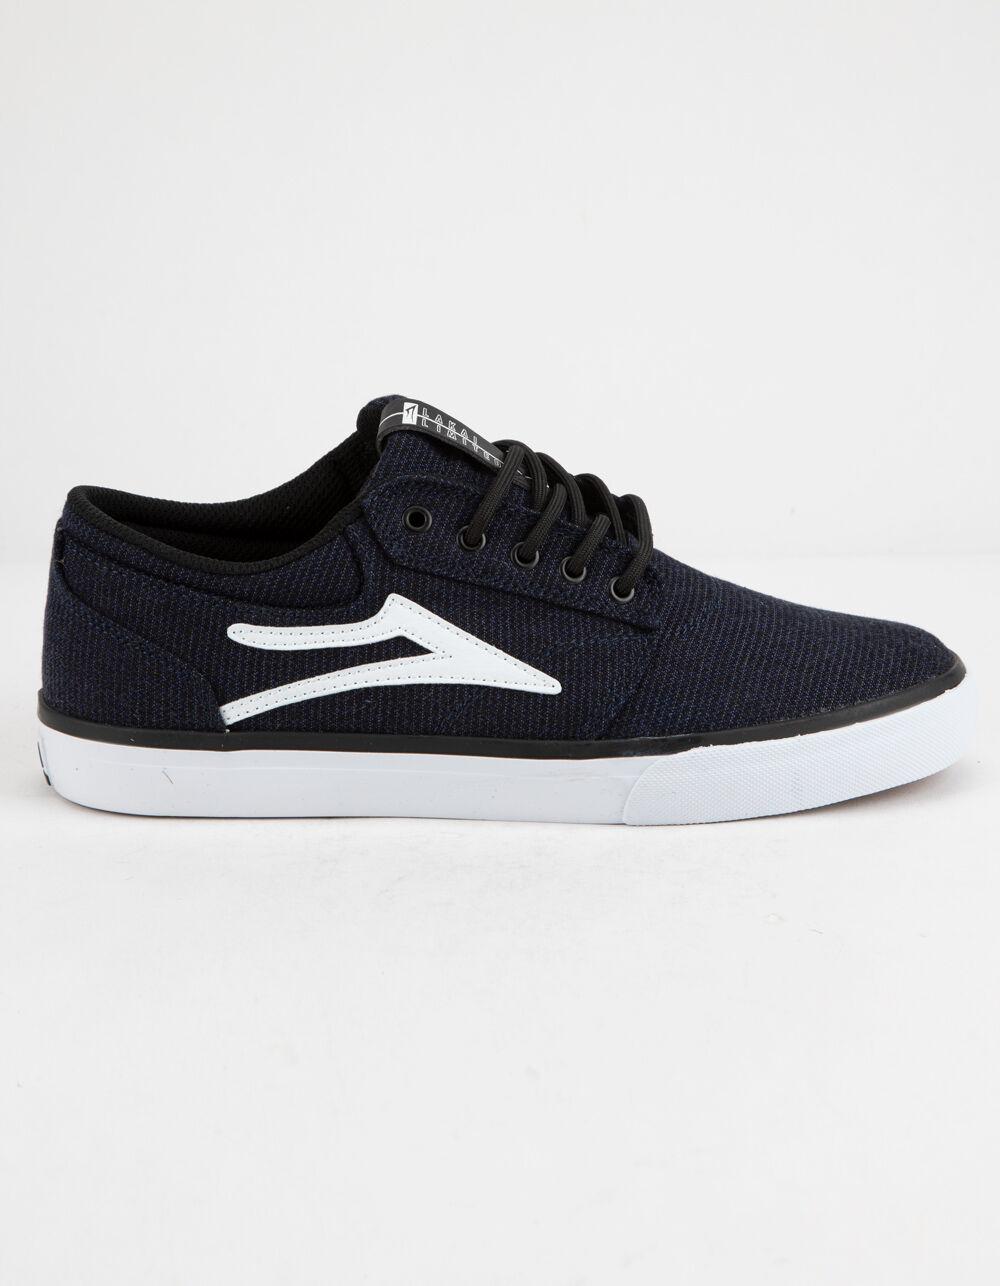 LAKAI Griffin Midnight Textile Shoes